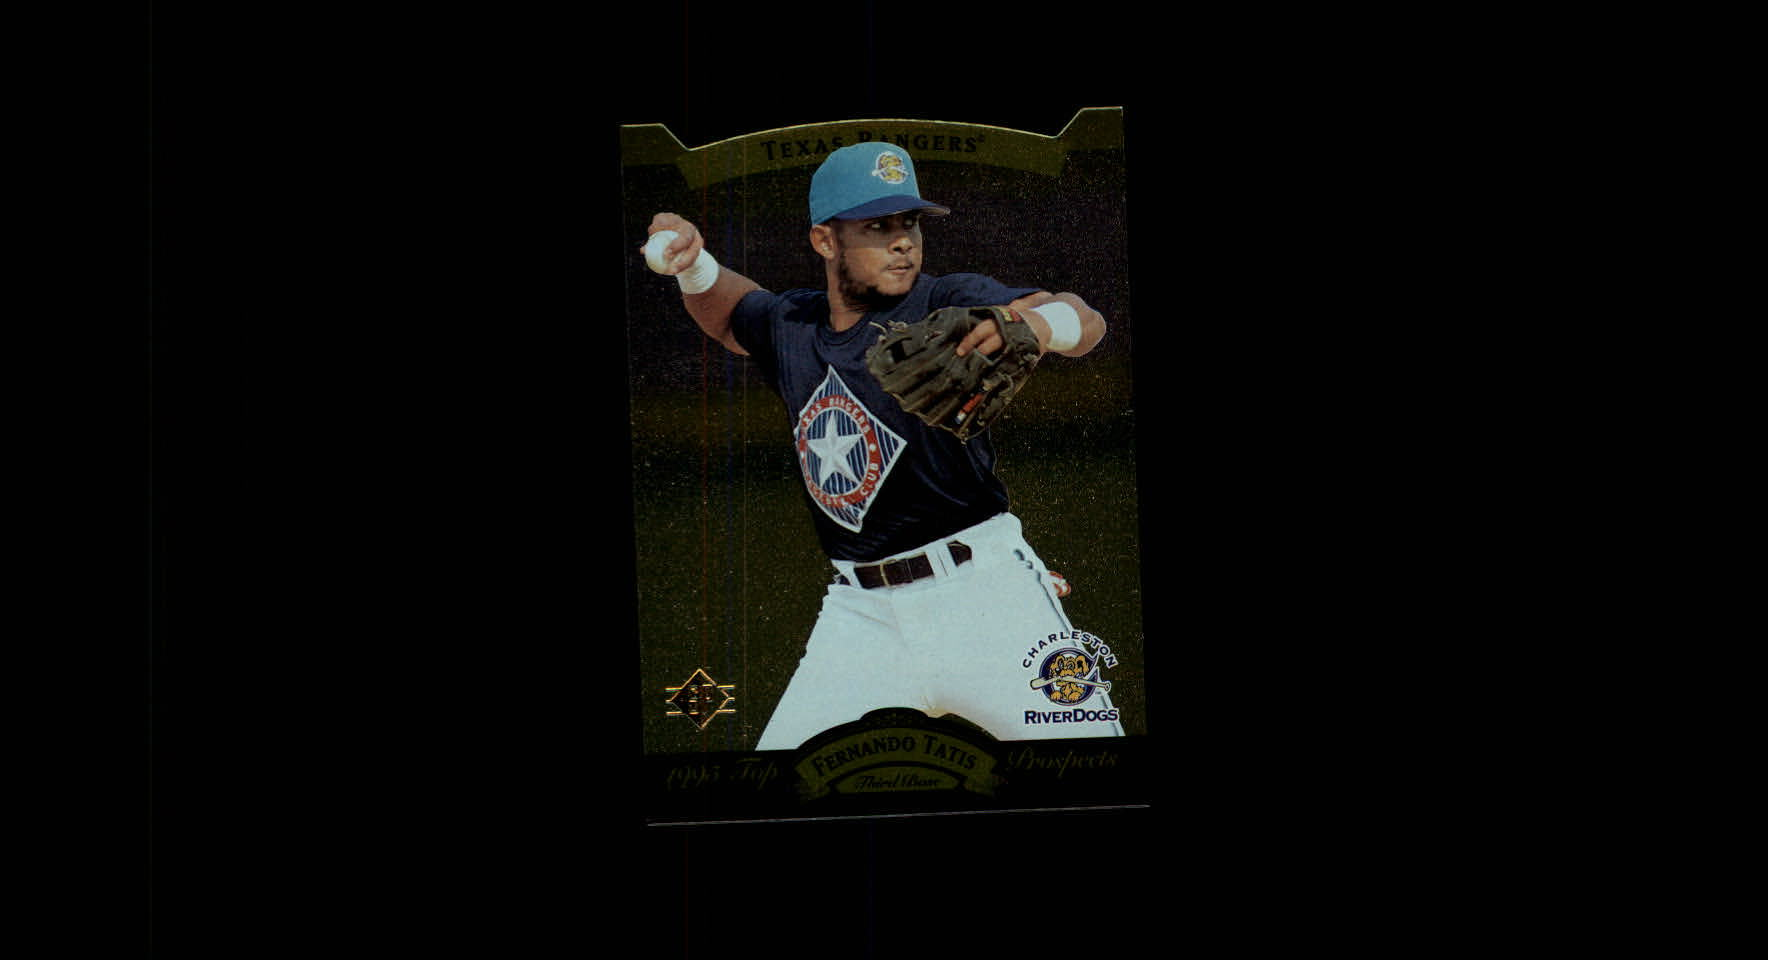 1995 SP Top Prospects #157 Fernando Tatis